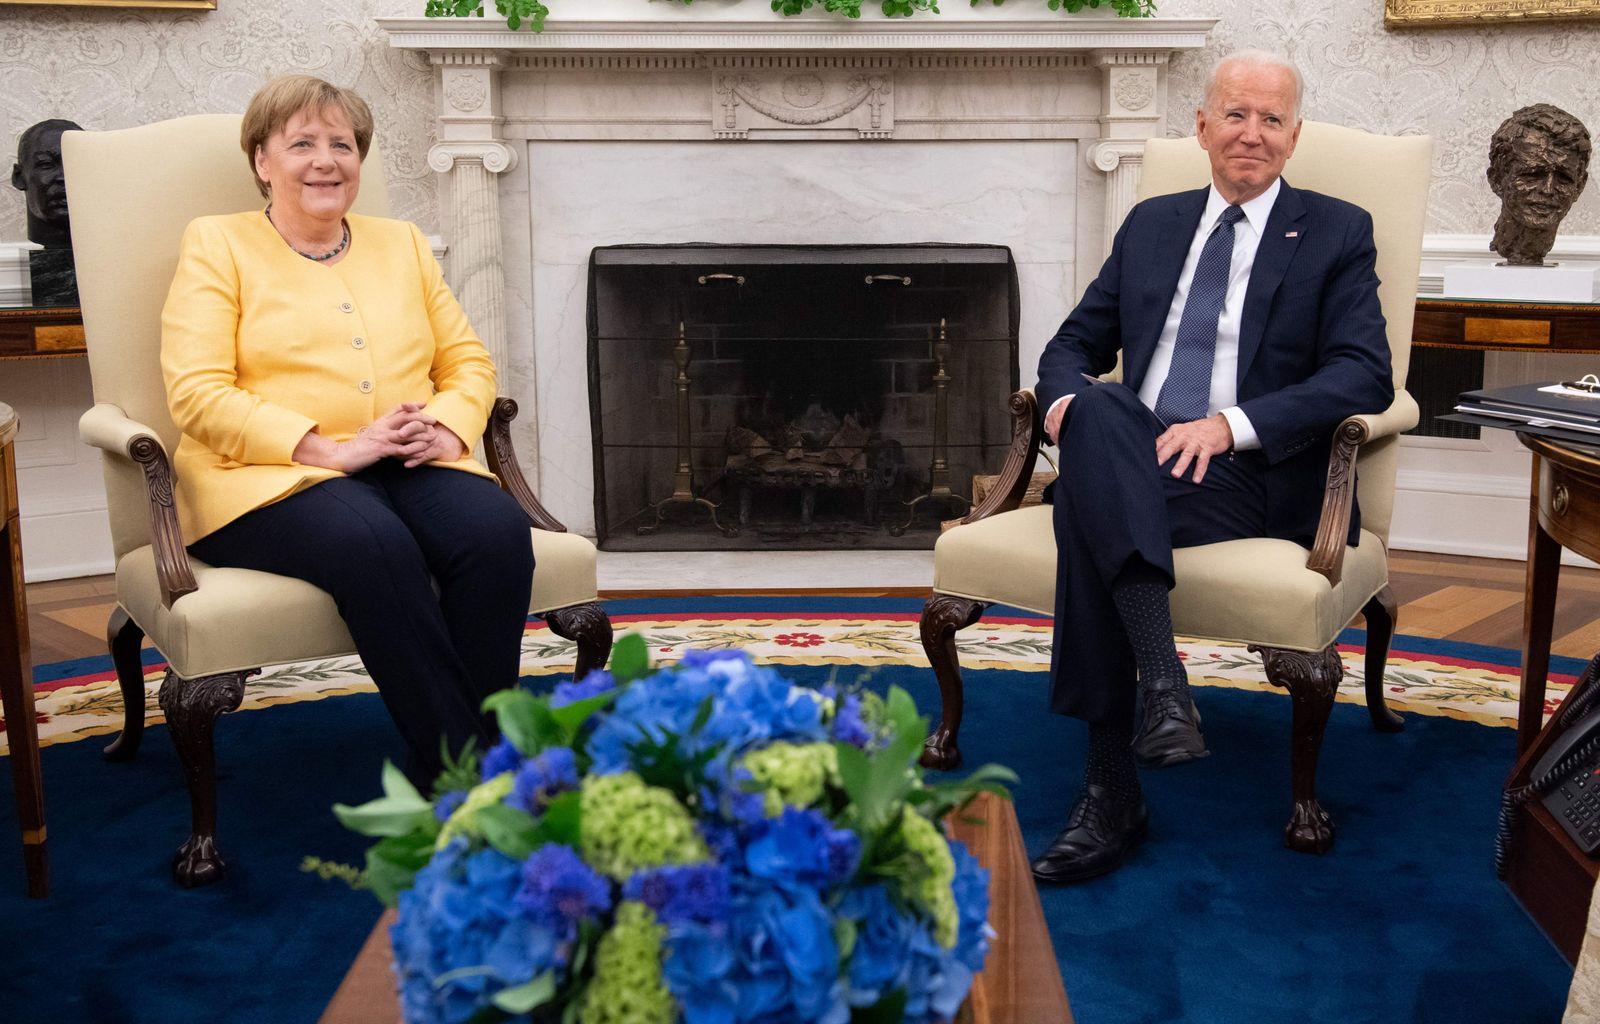 diplomacy-US-Germany-DIPLOMACY-BIDEN-MERKEL